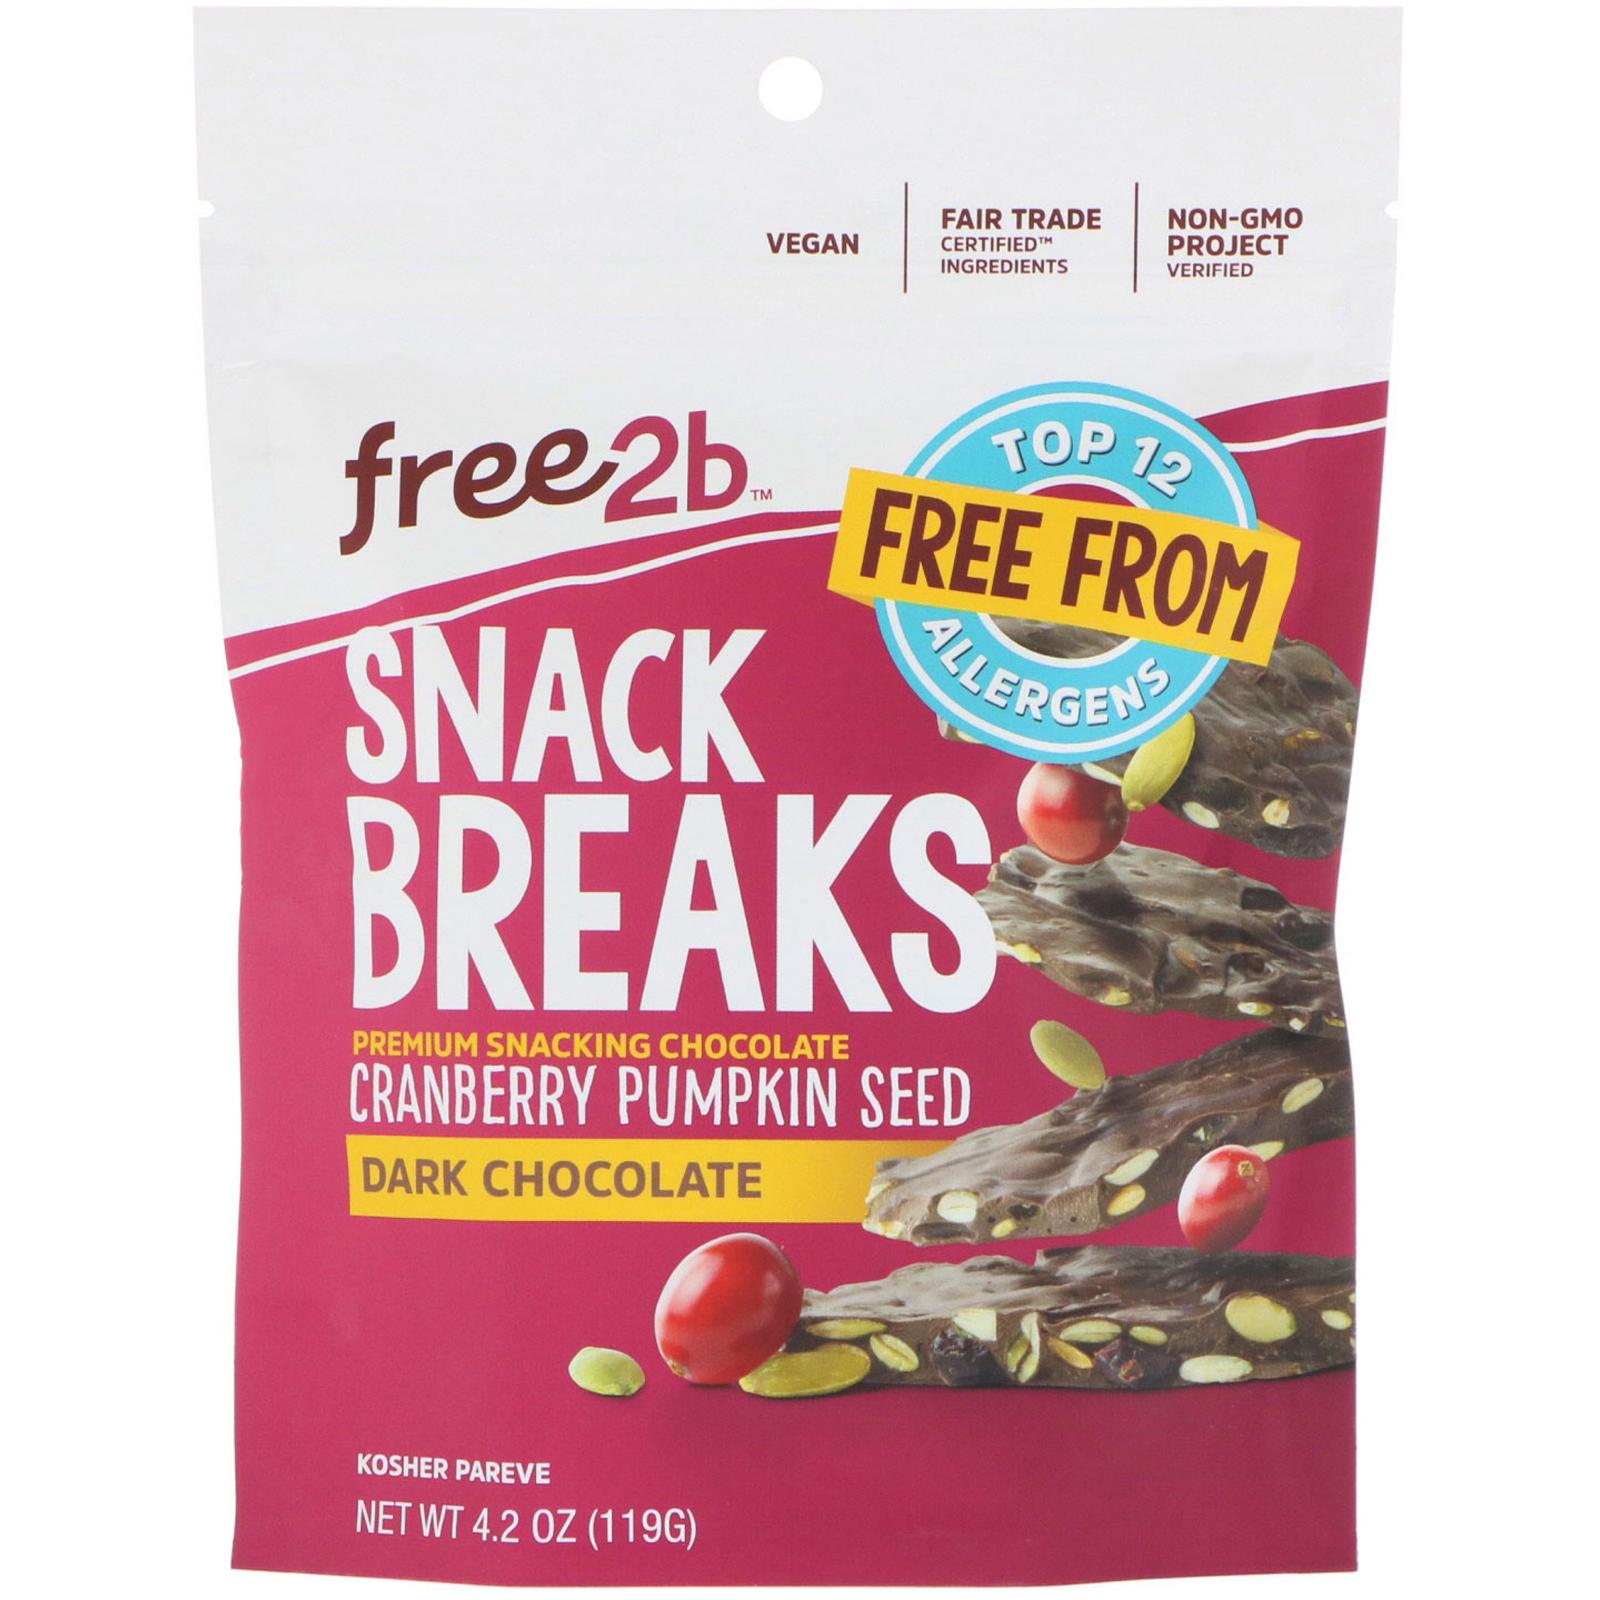 Free2B, Snack Breaks, Cranberry Pumpkin Seed, Dark Chocolate, 4.2 oz (119 g)